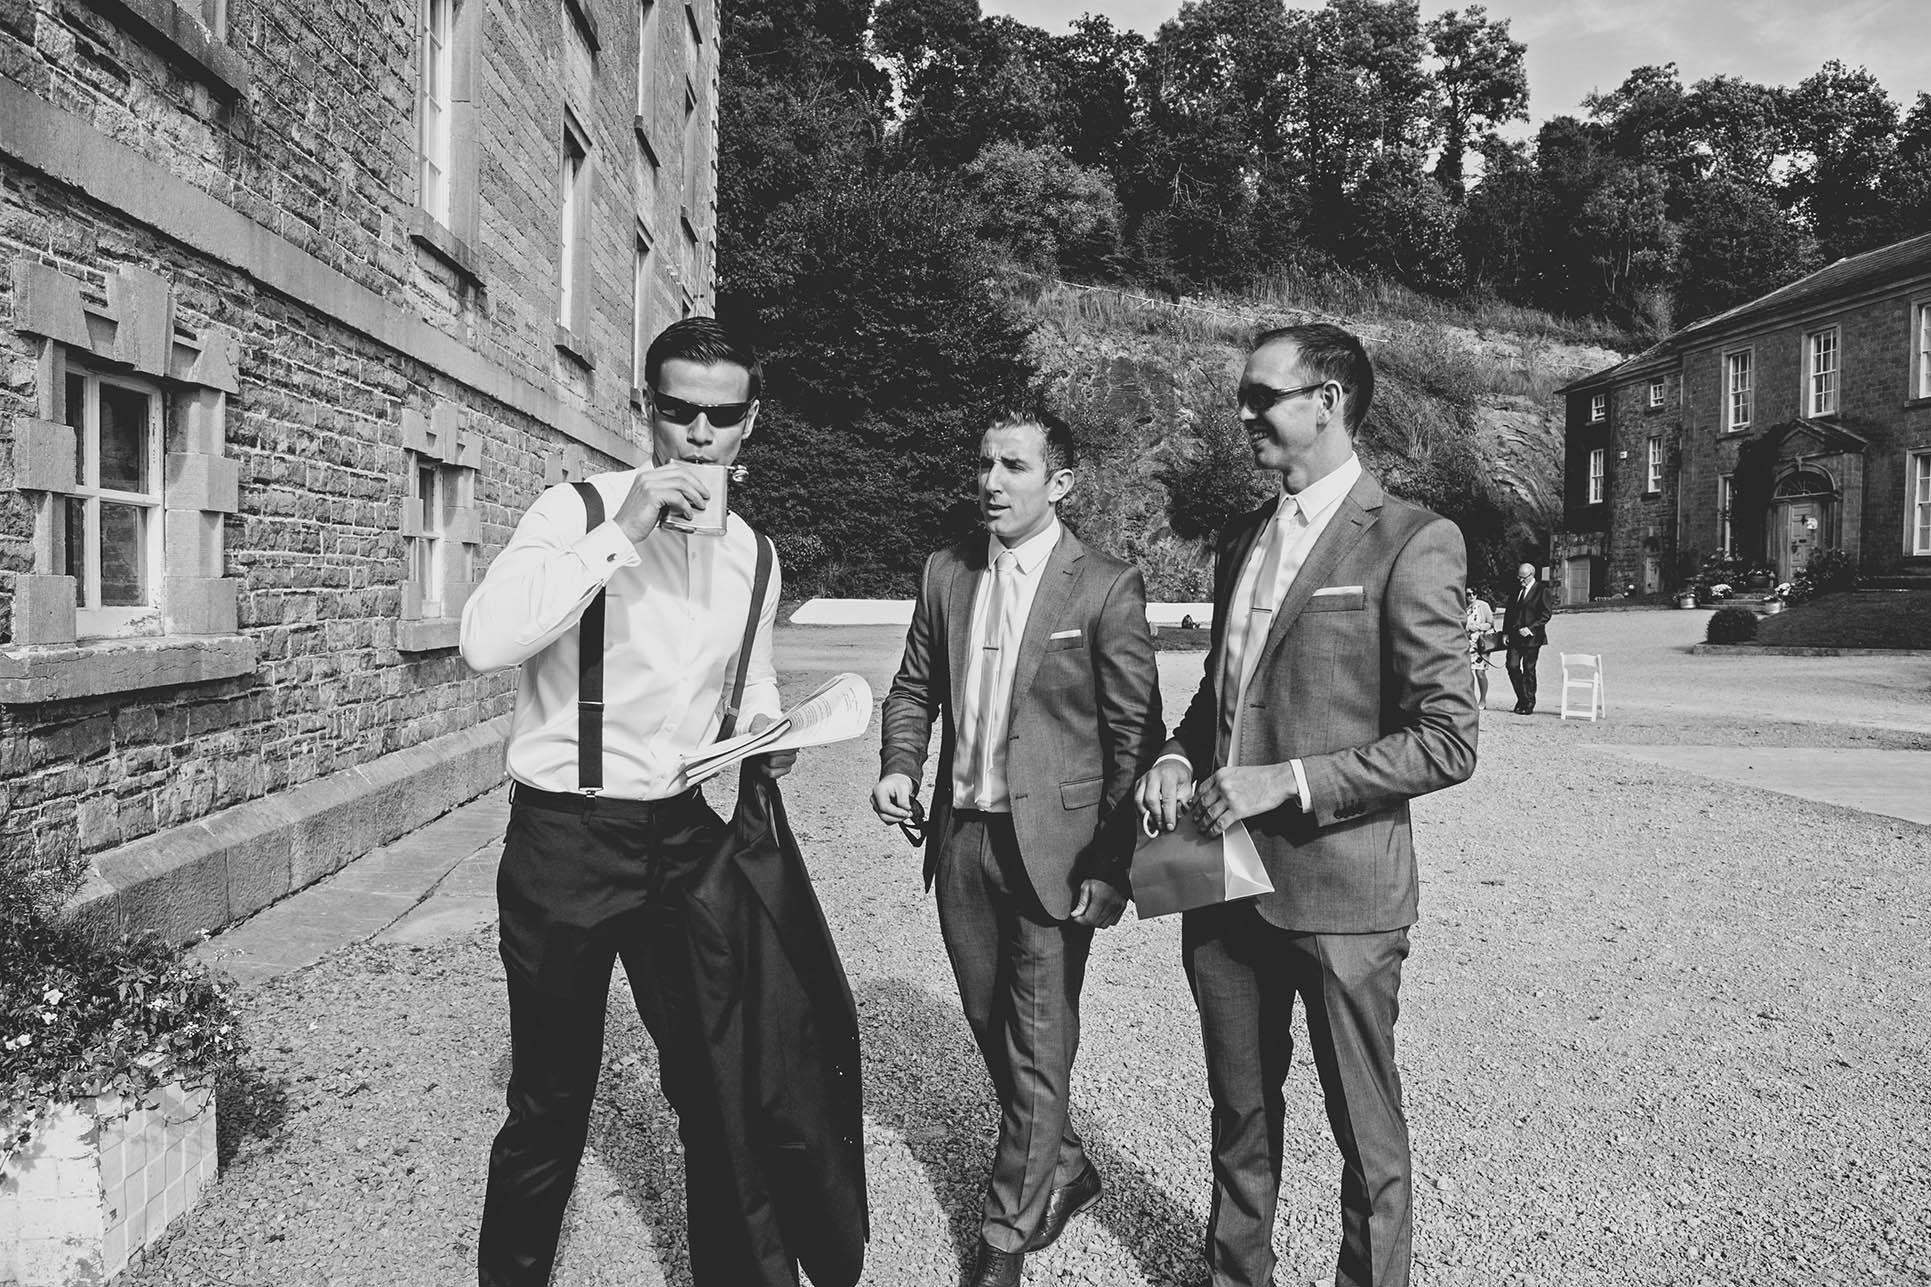 The Millhouse, Slane wedding 2014, Groom having a drink from hip flask